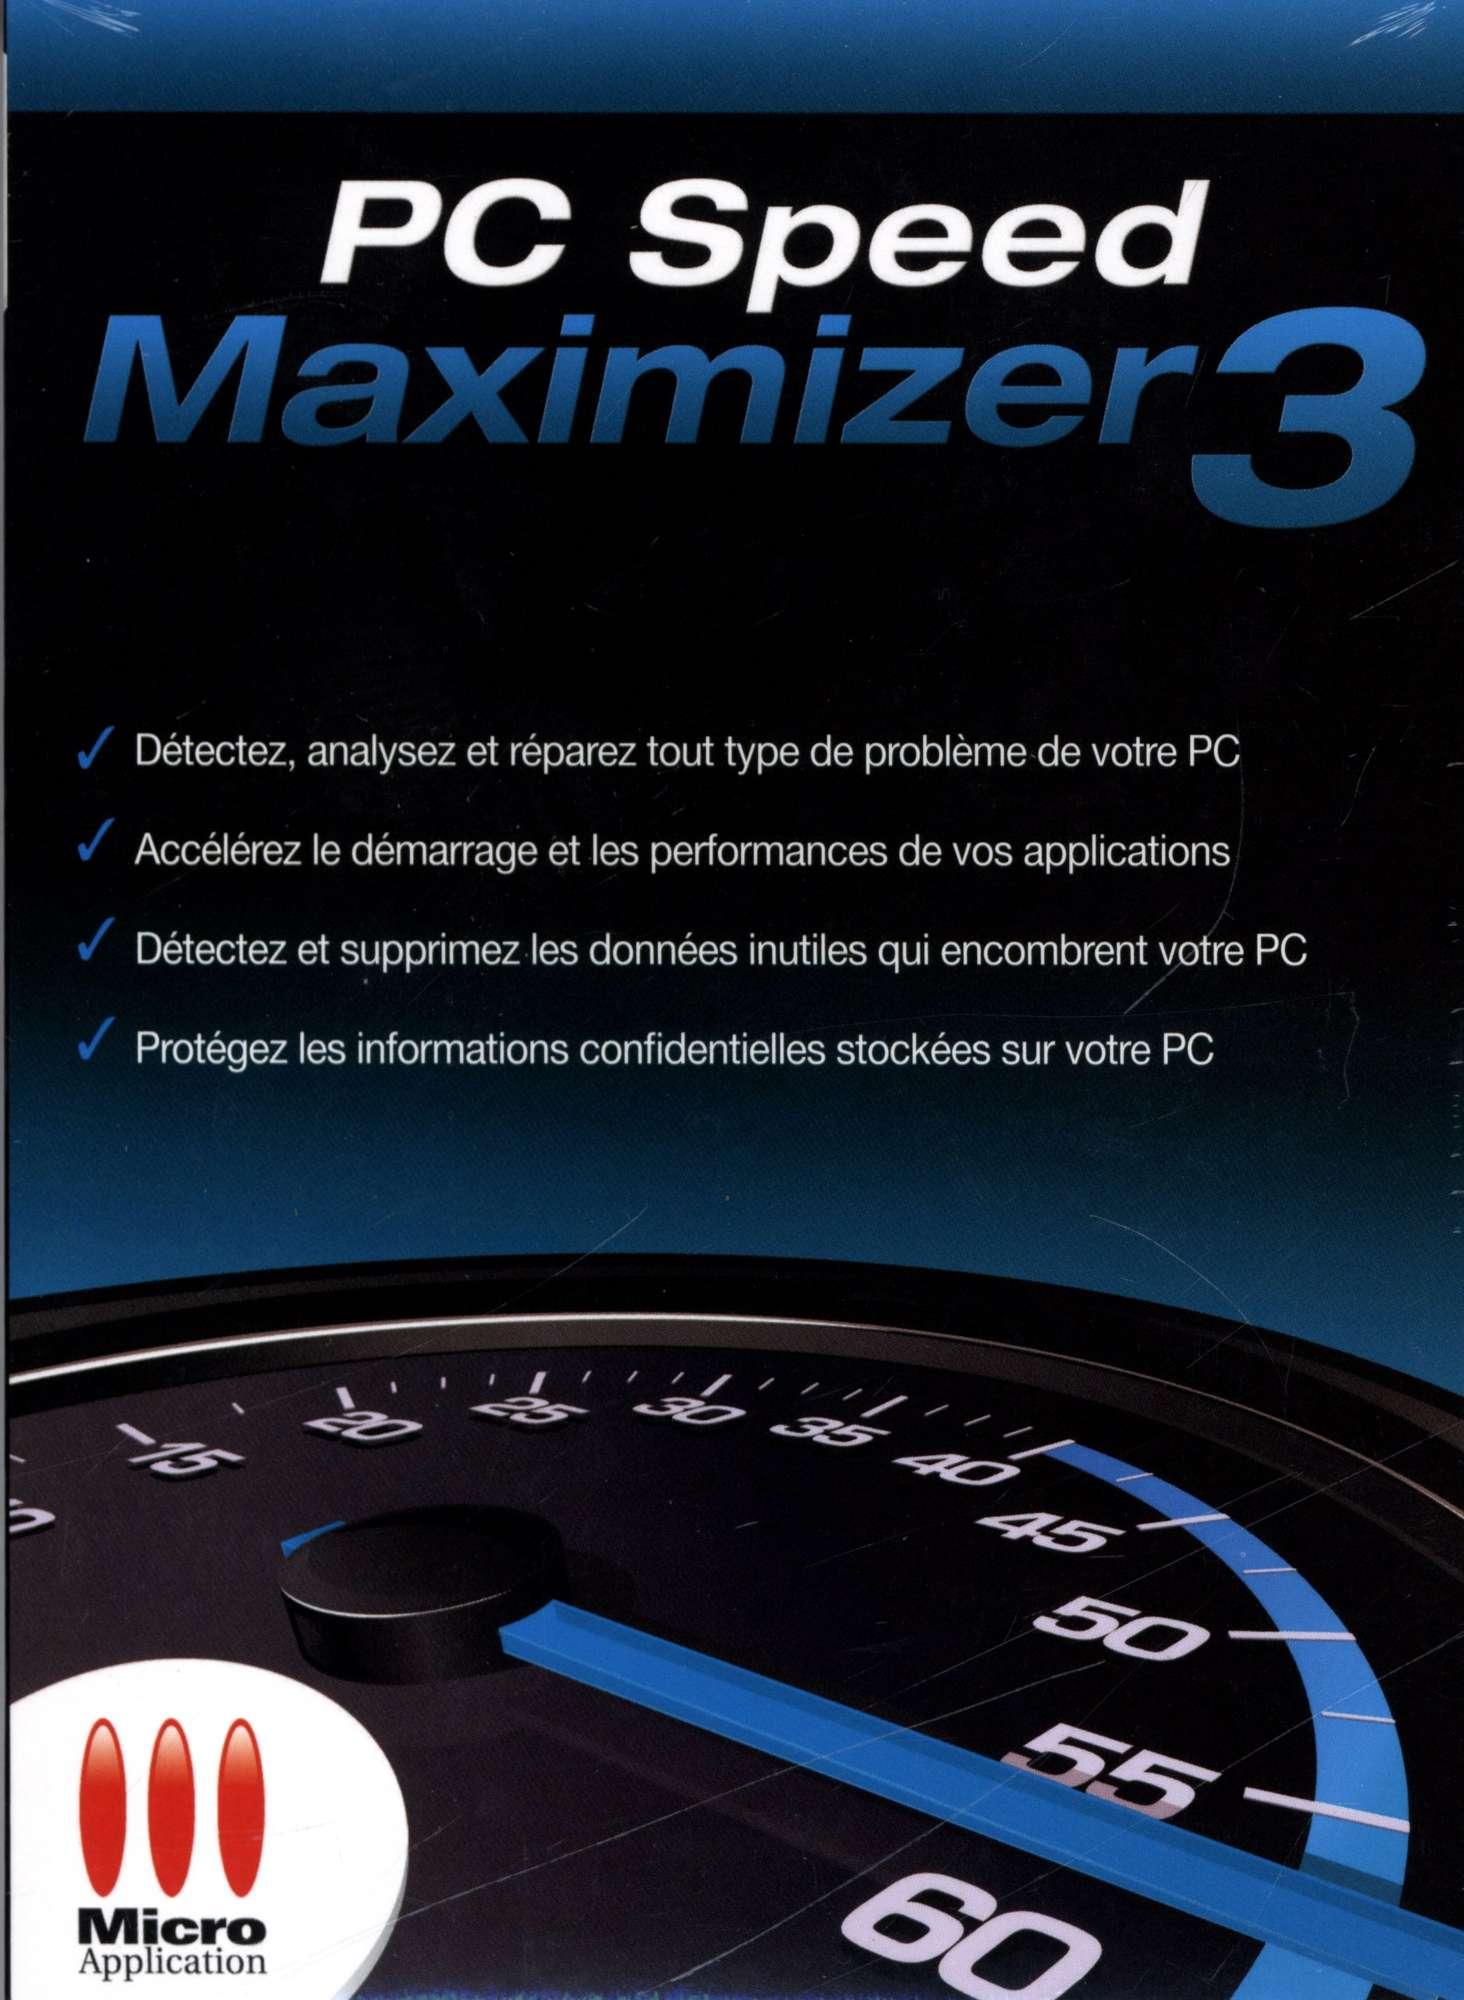 PC Speed Maximizer [Micro Application]